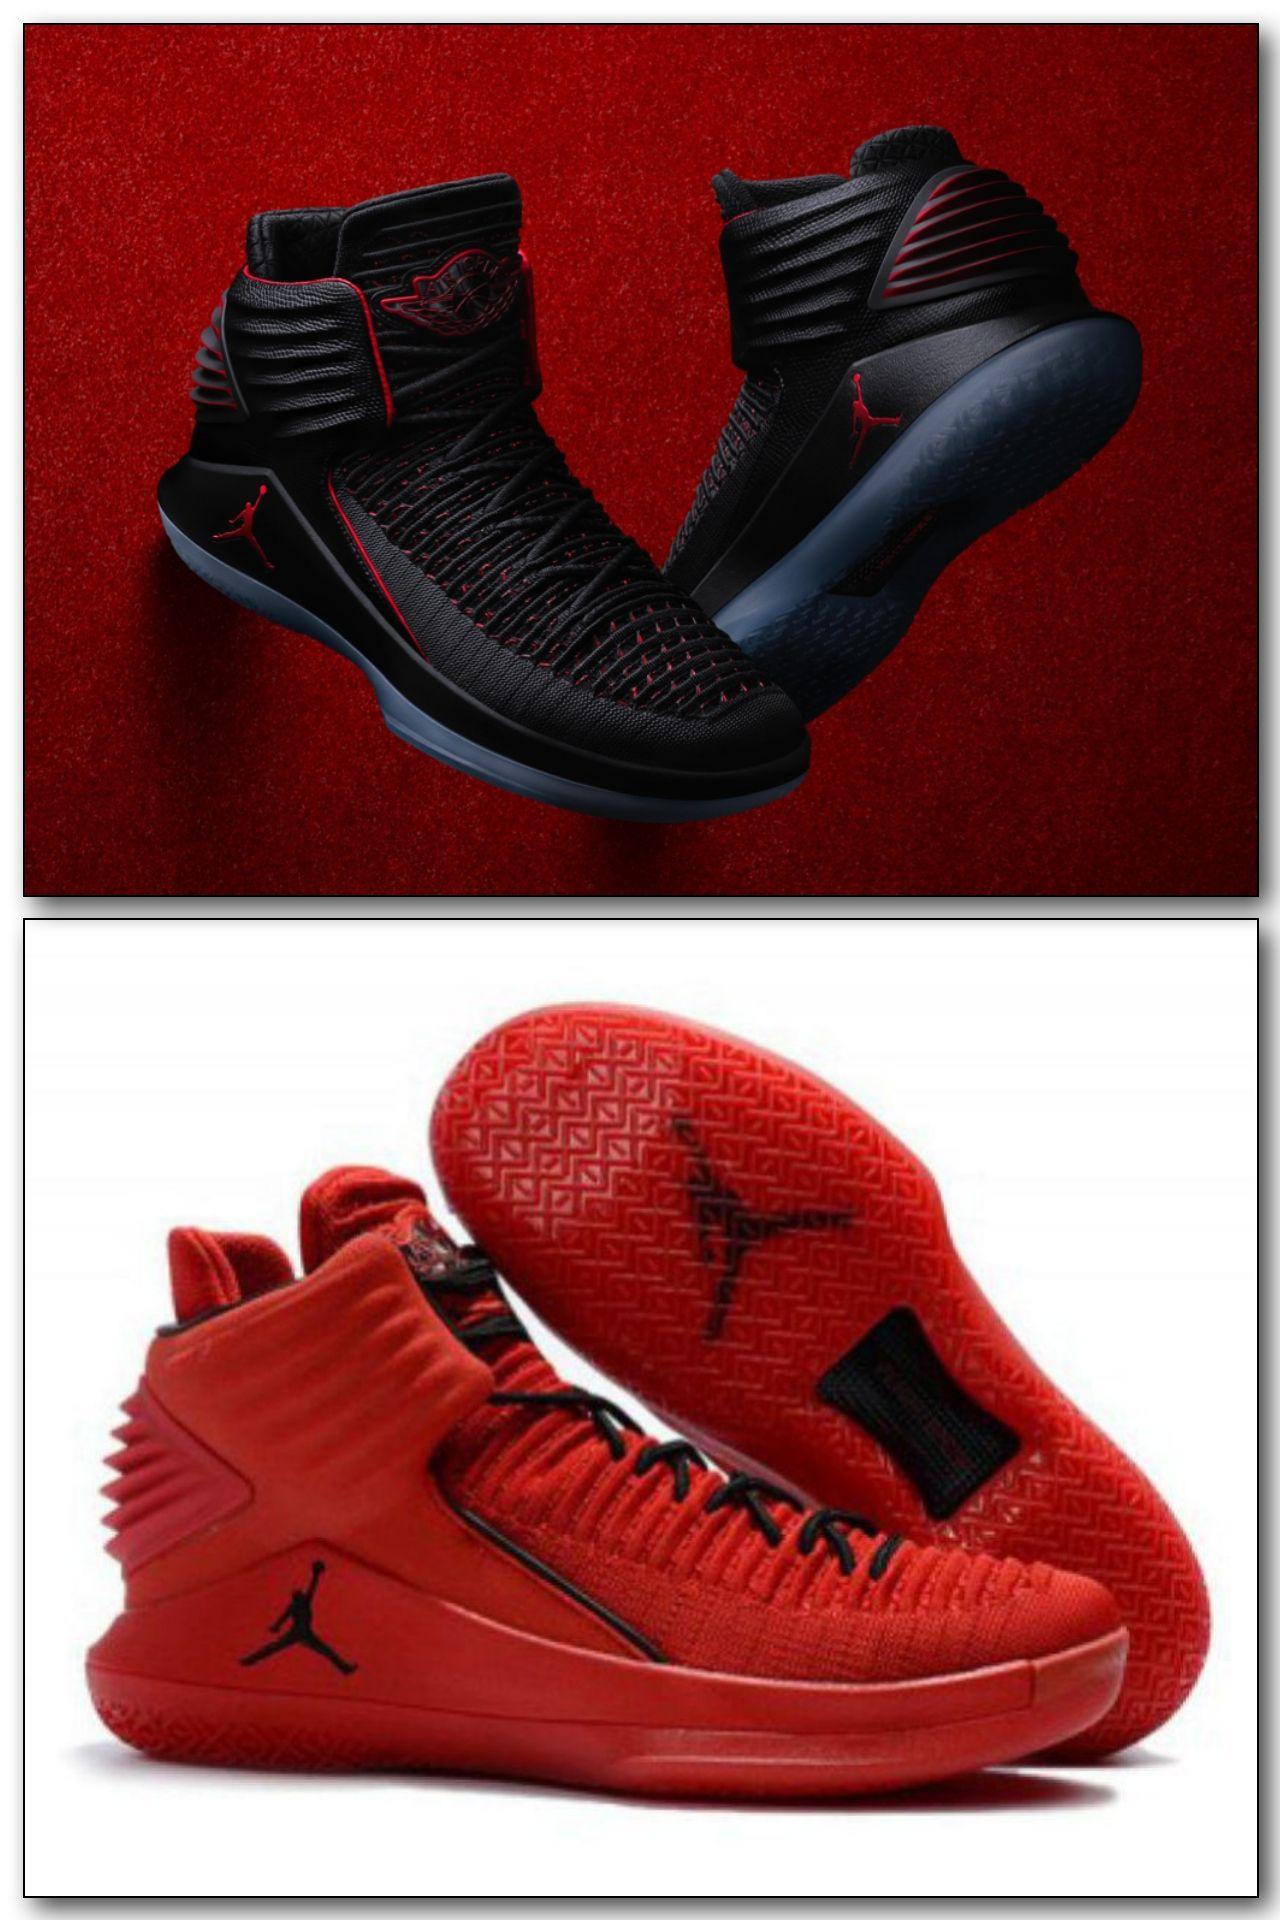 2020 Air Jordan 32 Flyknit For Perfect Kicks In 2020 Air Jordans Basketball Shoes Jordans